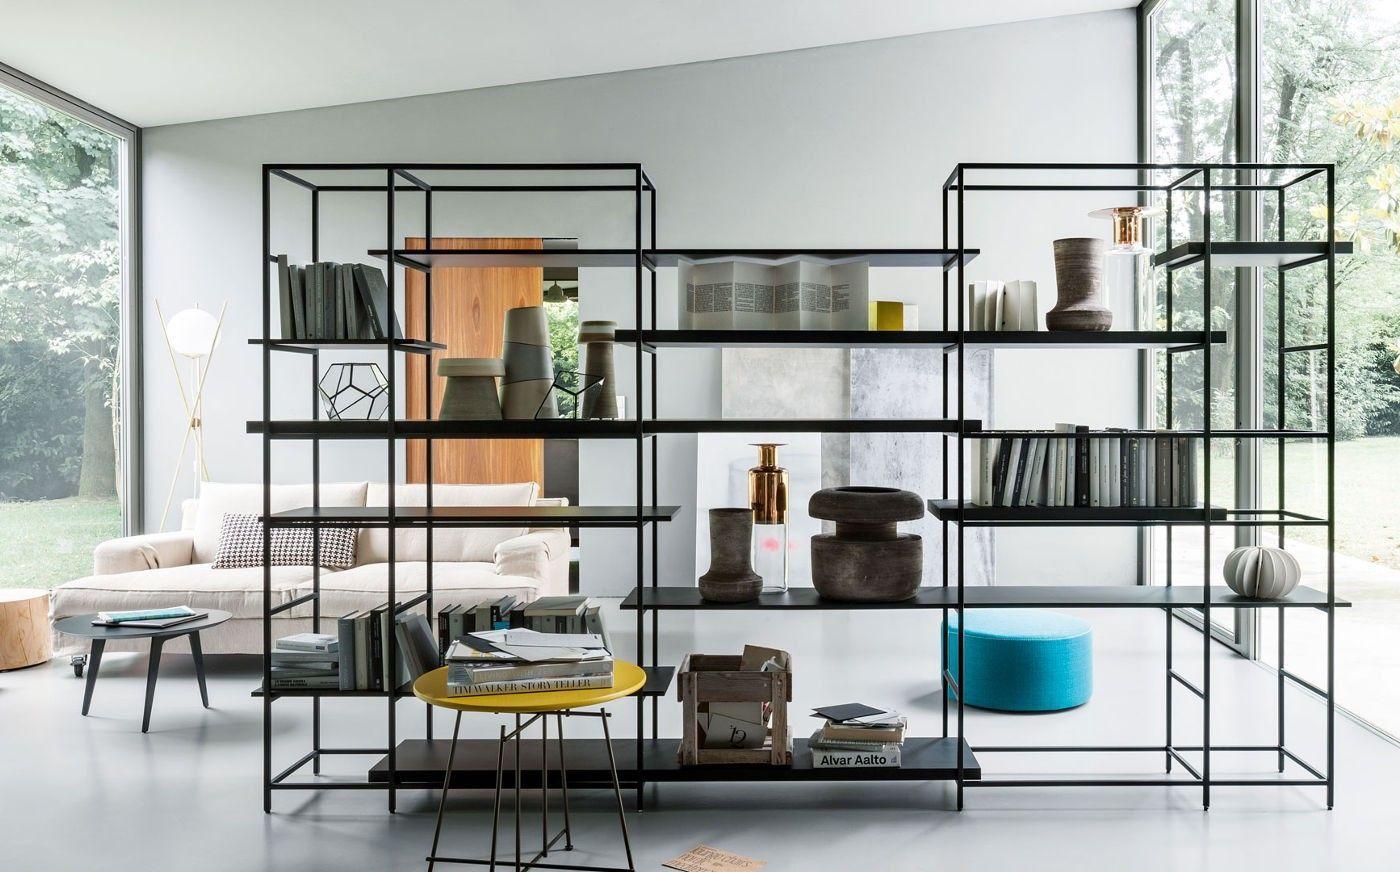 Roomdevider In Woonkamer : 5 simple and impressive tricks: fabric room divider basements room